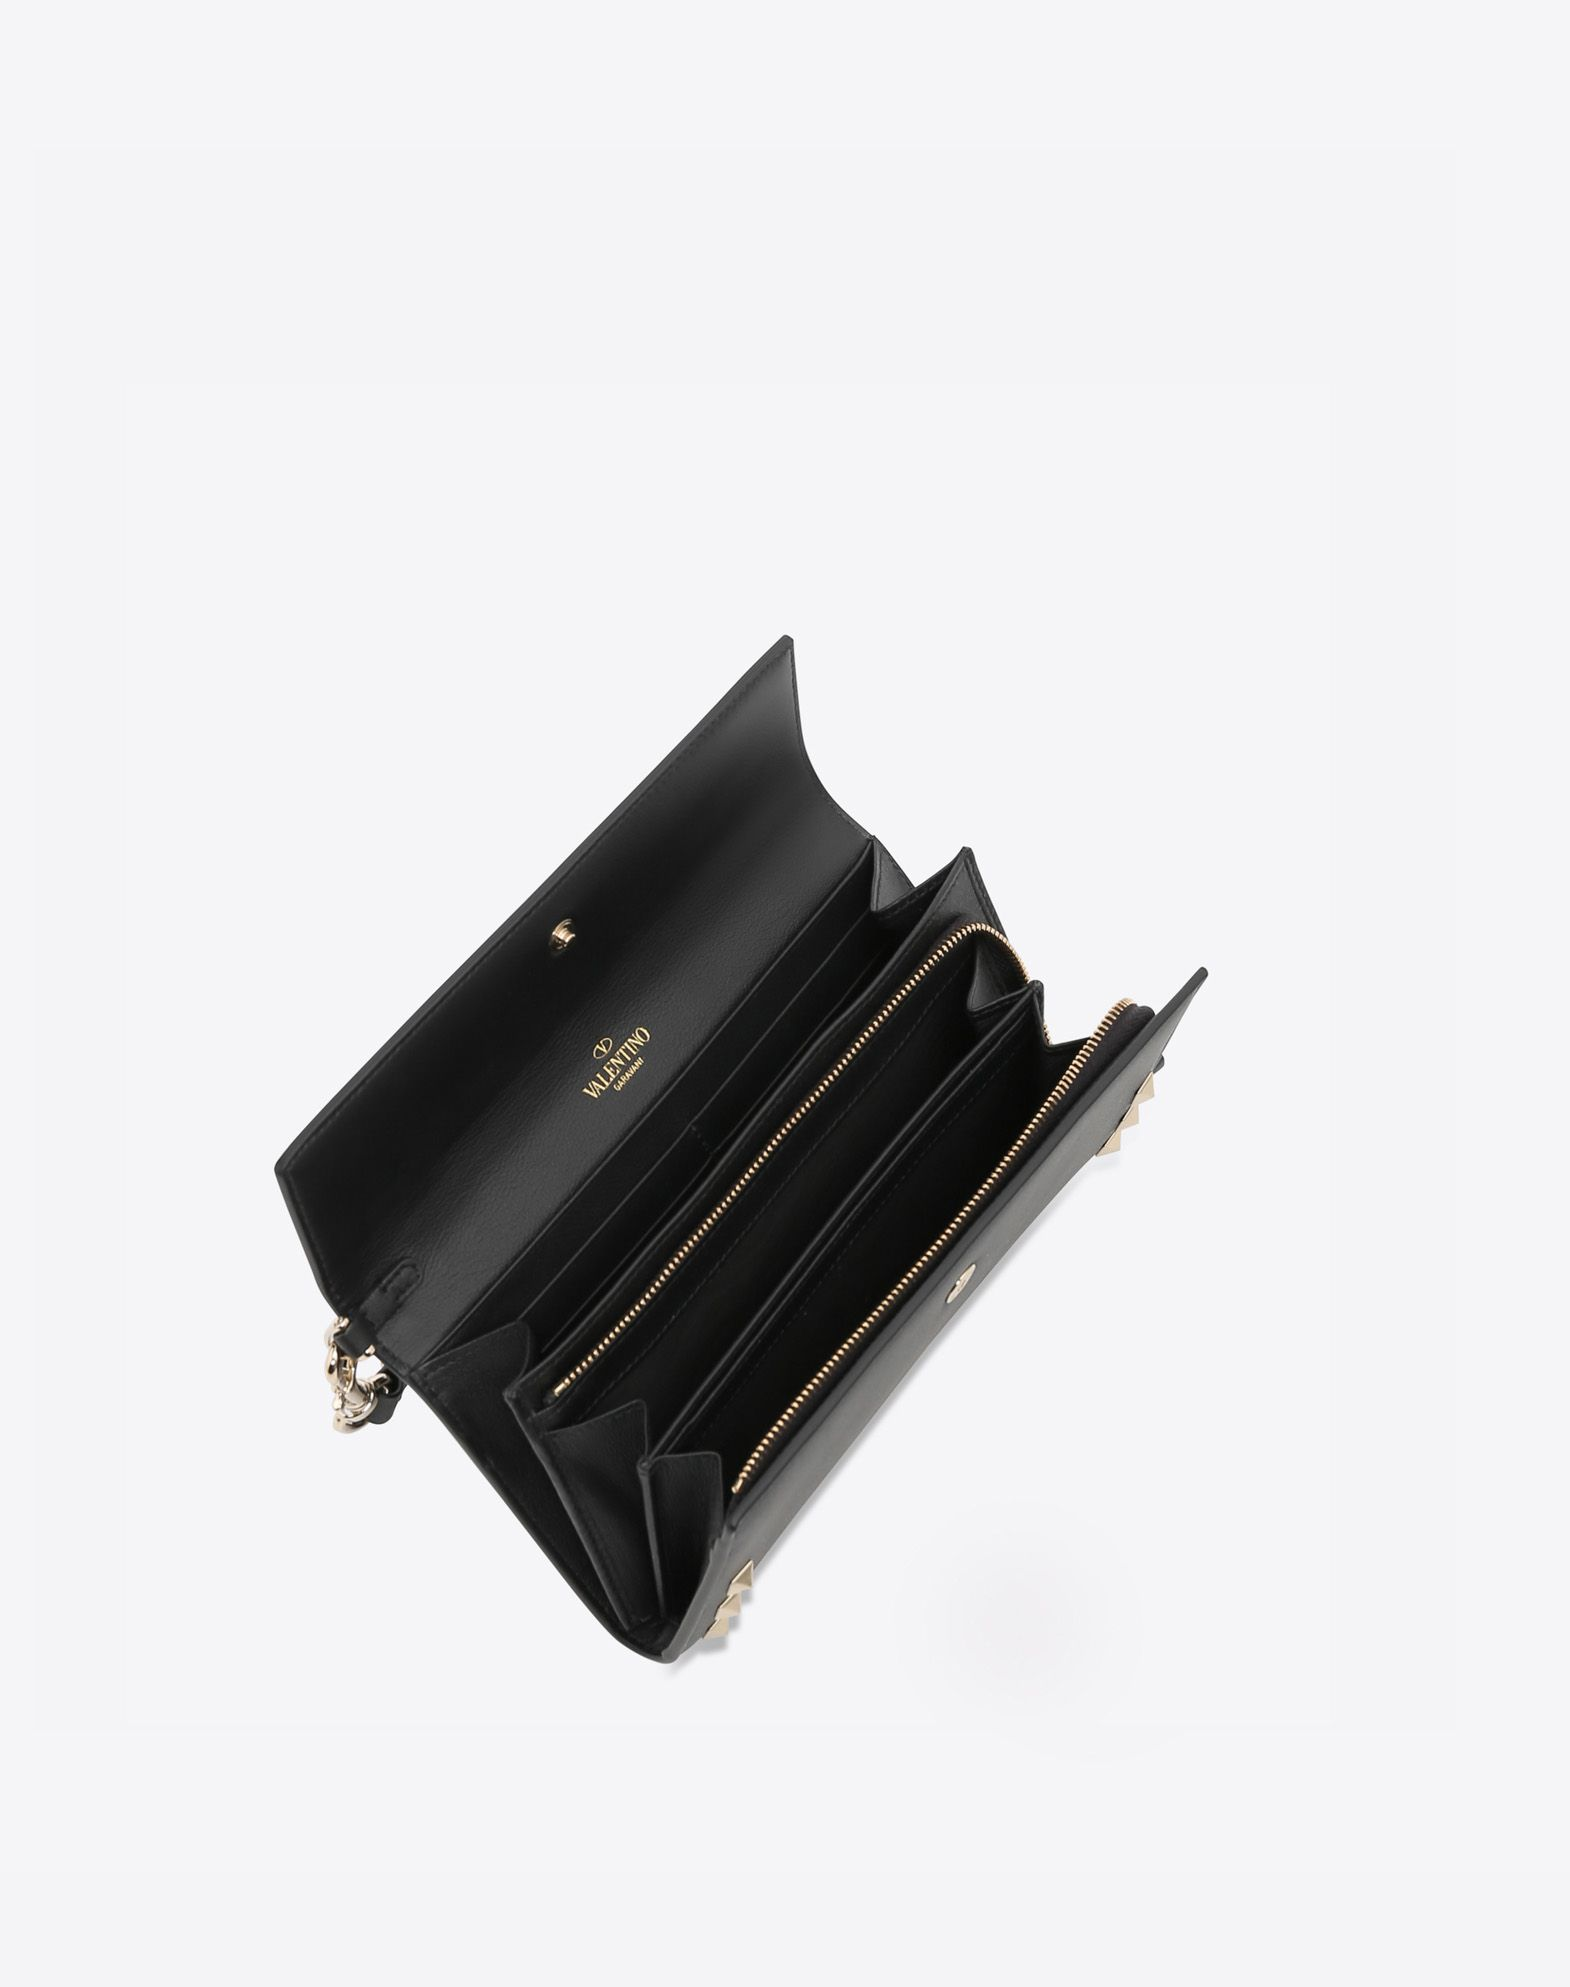 VALENTINO GARAVANI Rockstud Wallet FLAP WALLETS D a